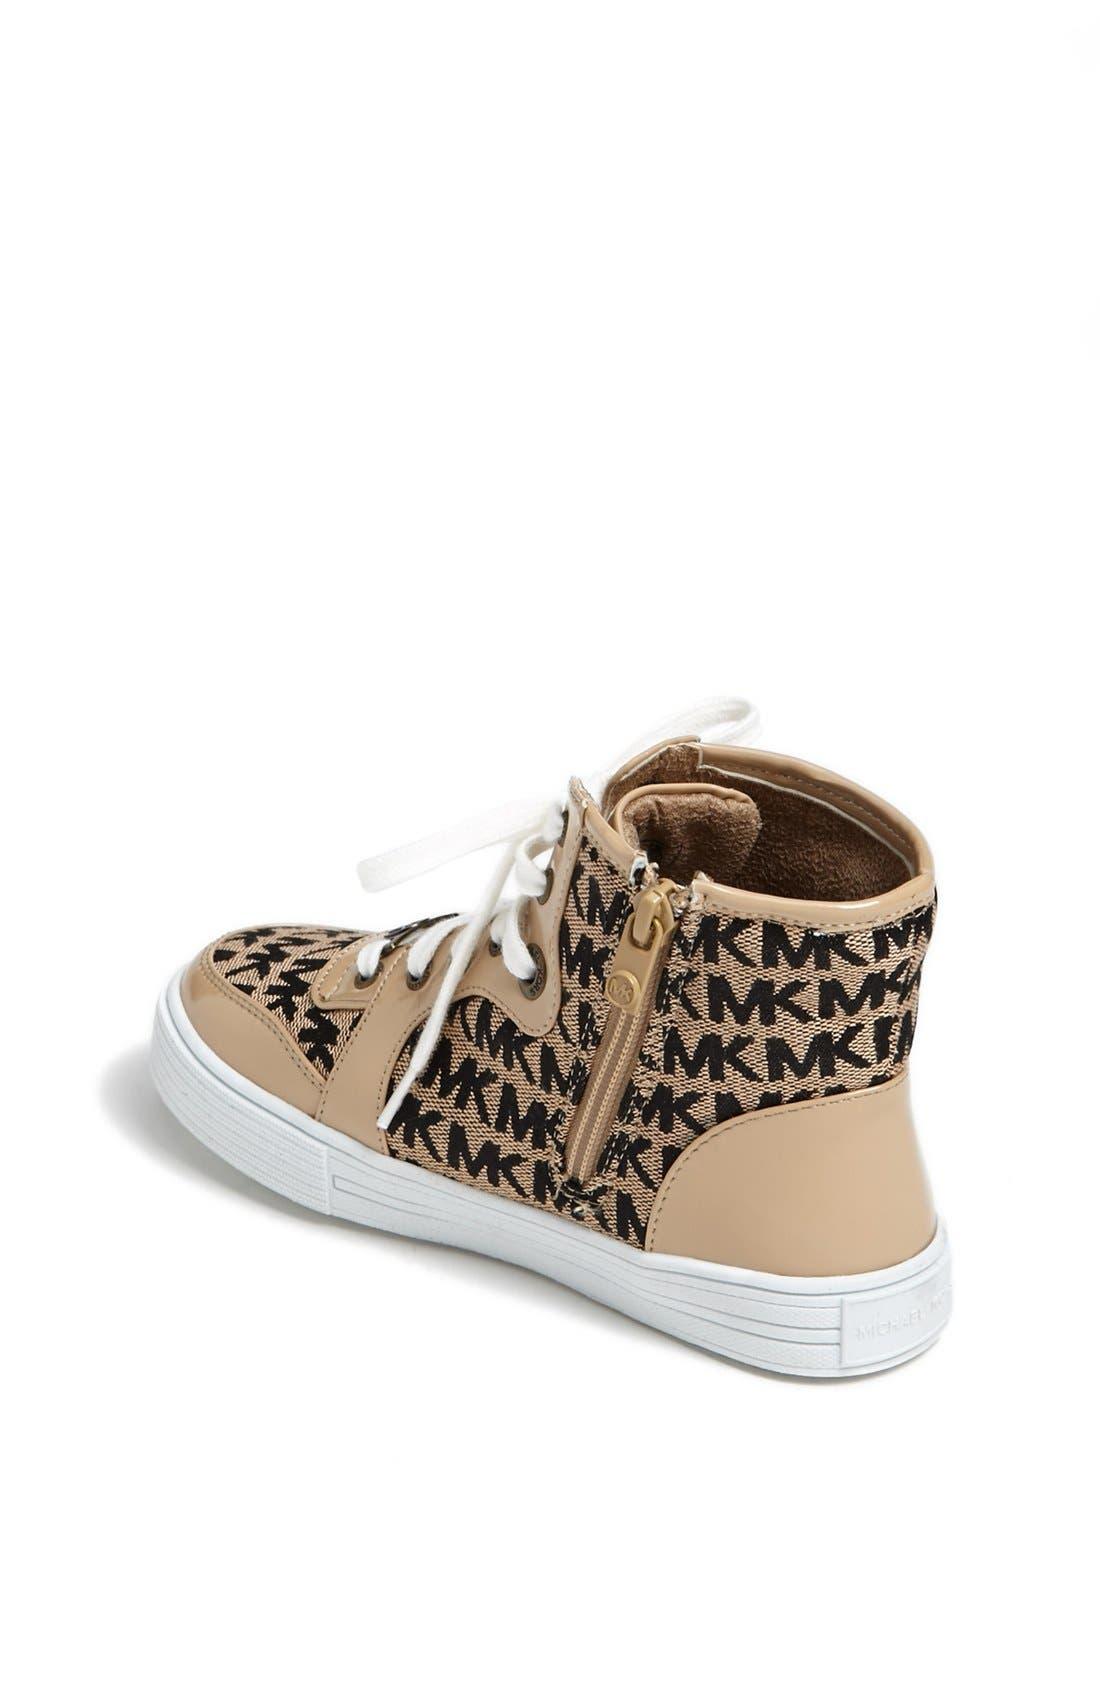 Alternate Image 2  - MICHAEL Michael Kors 'Arctic' High Top Sneaker (Walker, Toddler, Little Kid & Big Kid)